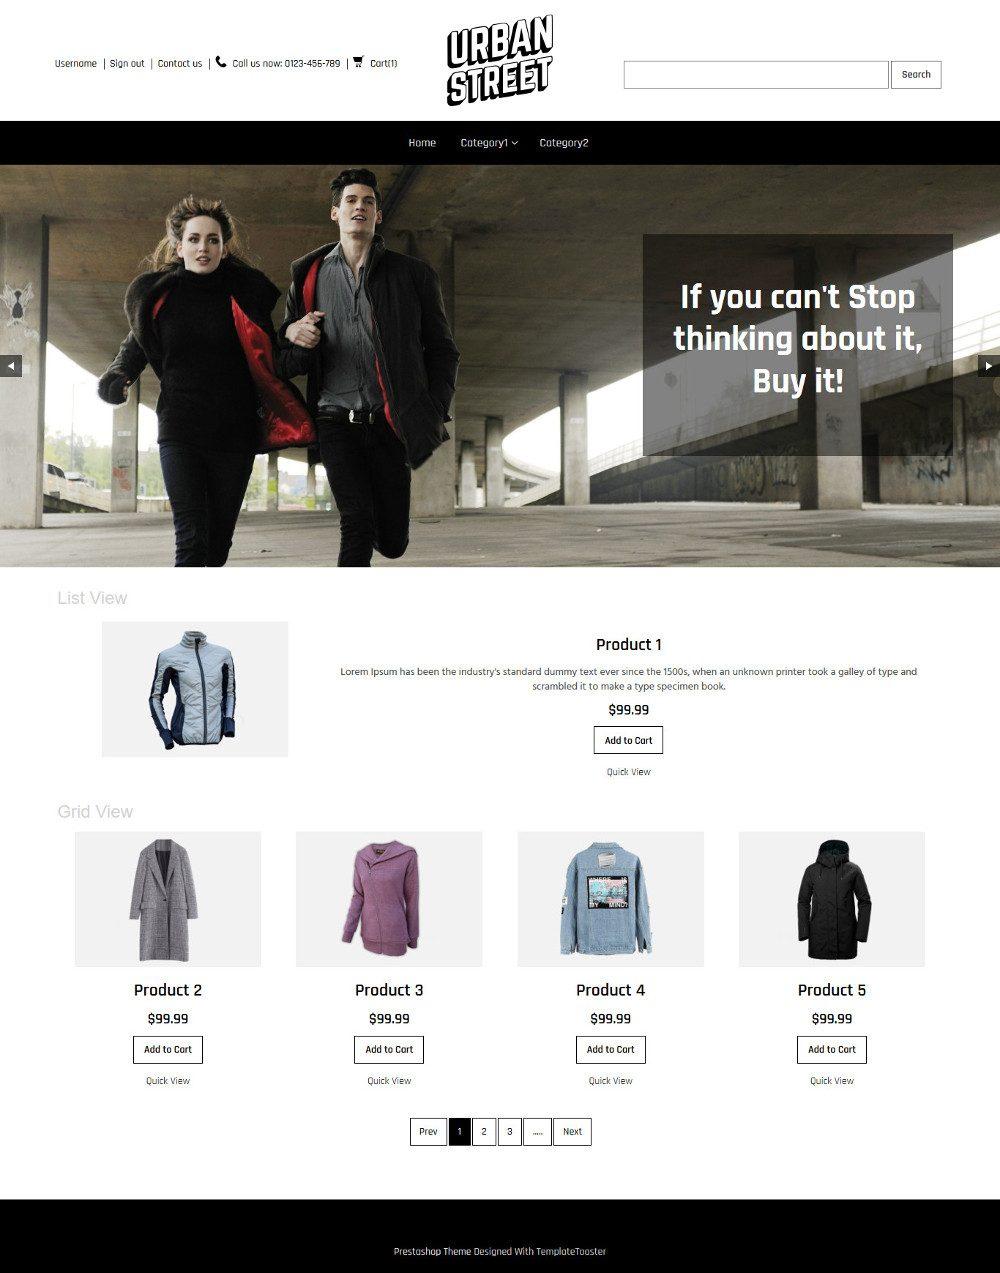 Urban Street Clothing Store Virtuemart Template